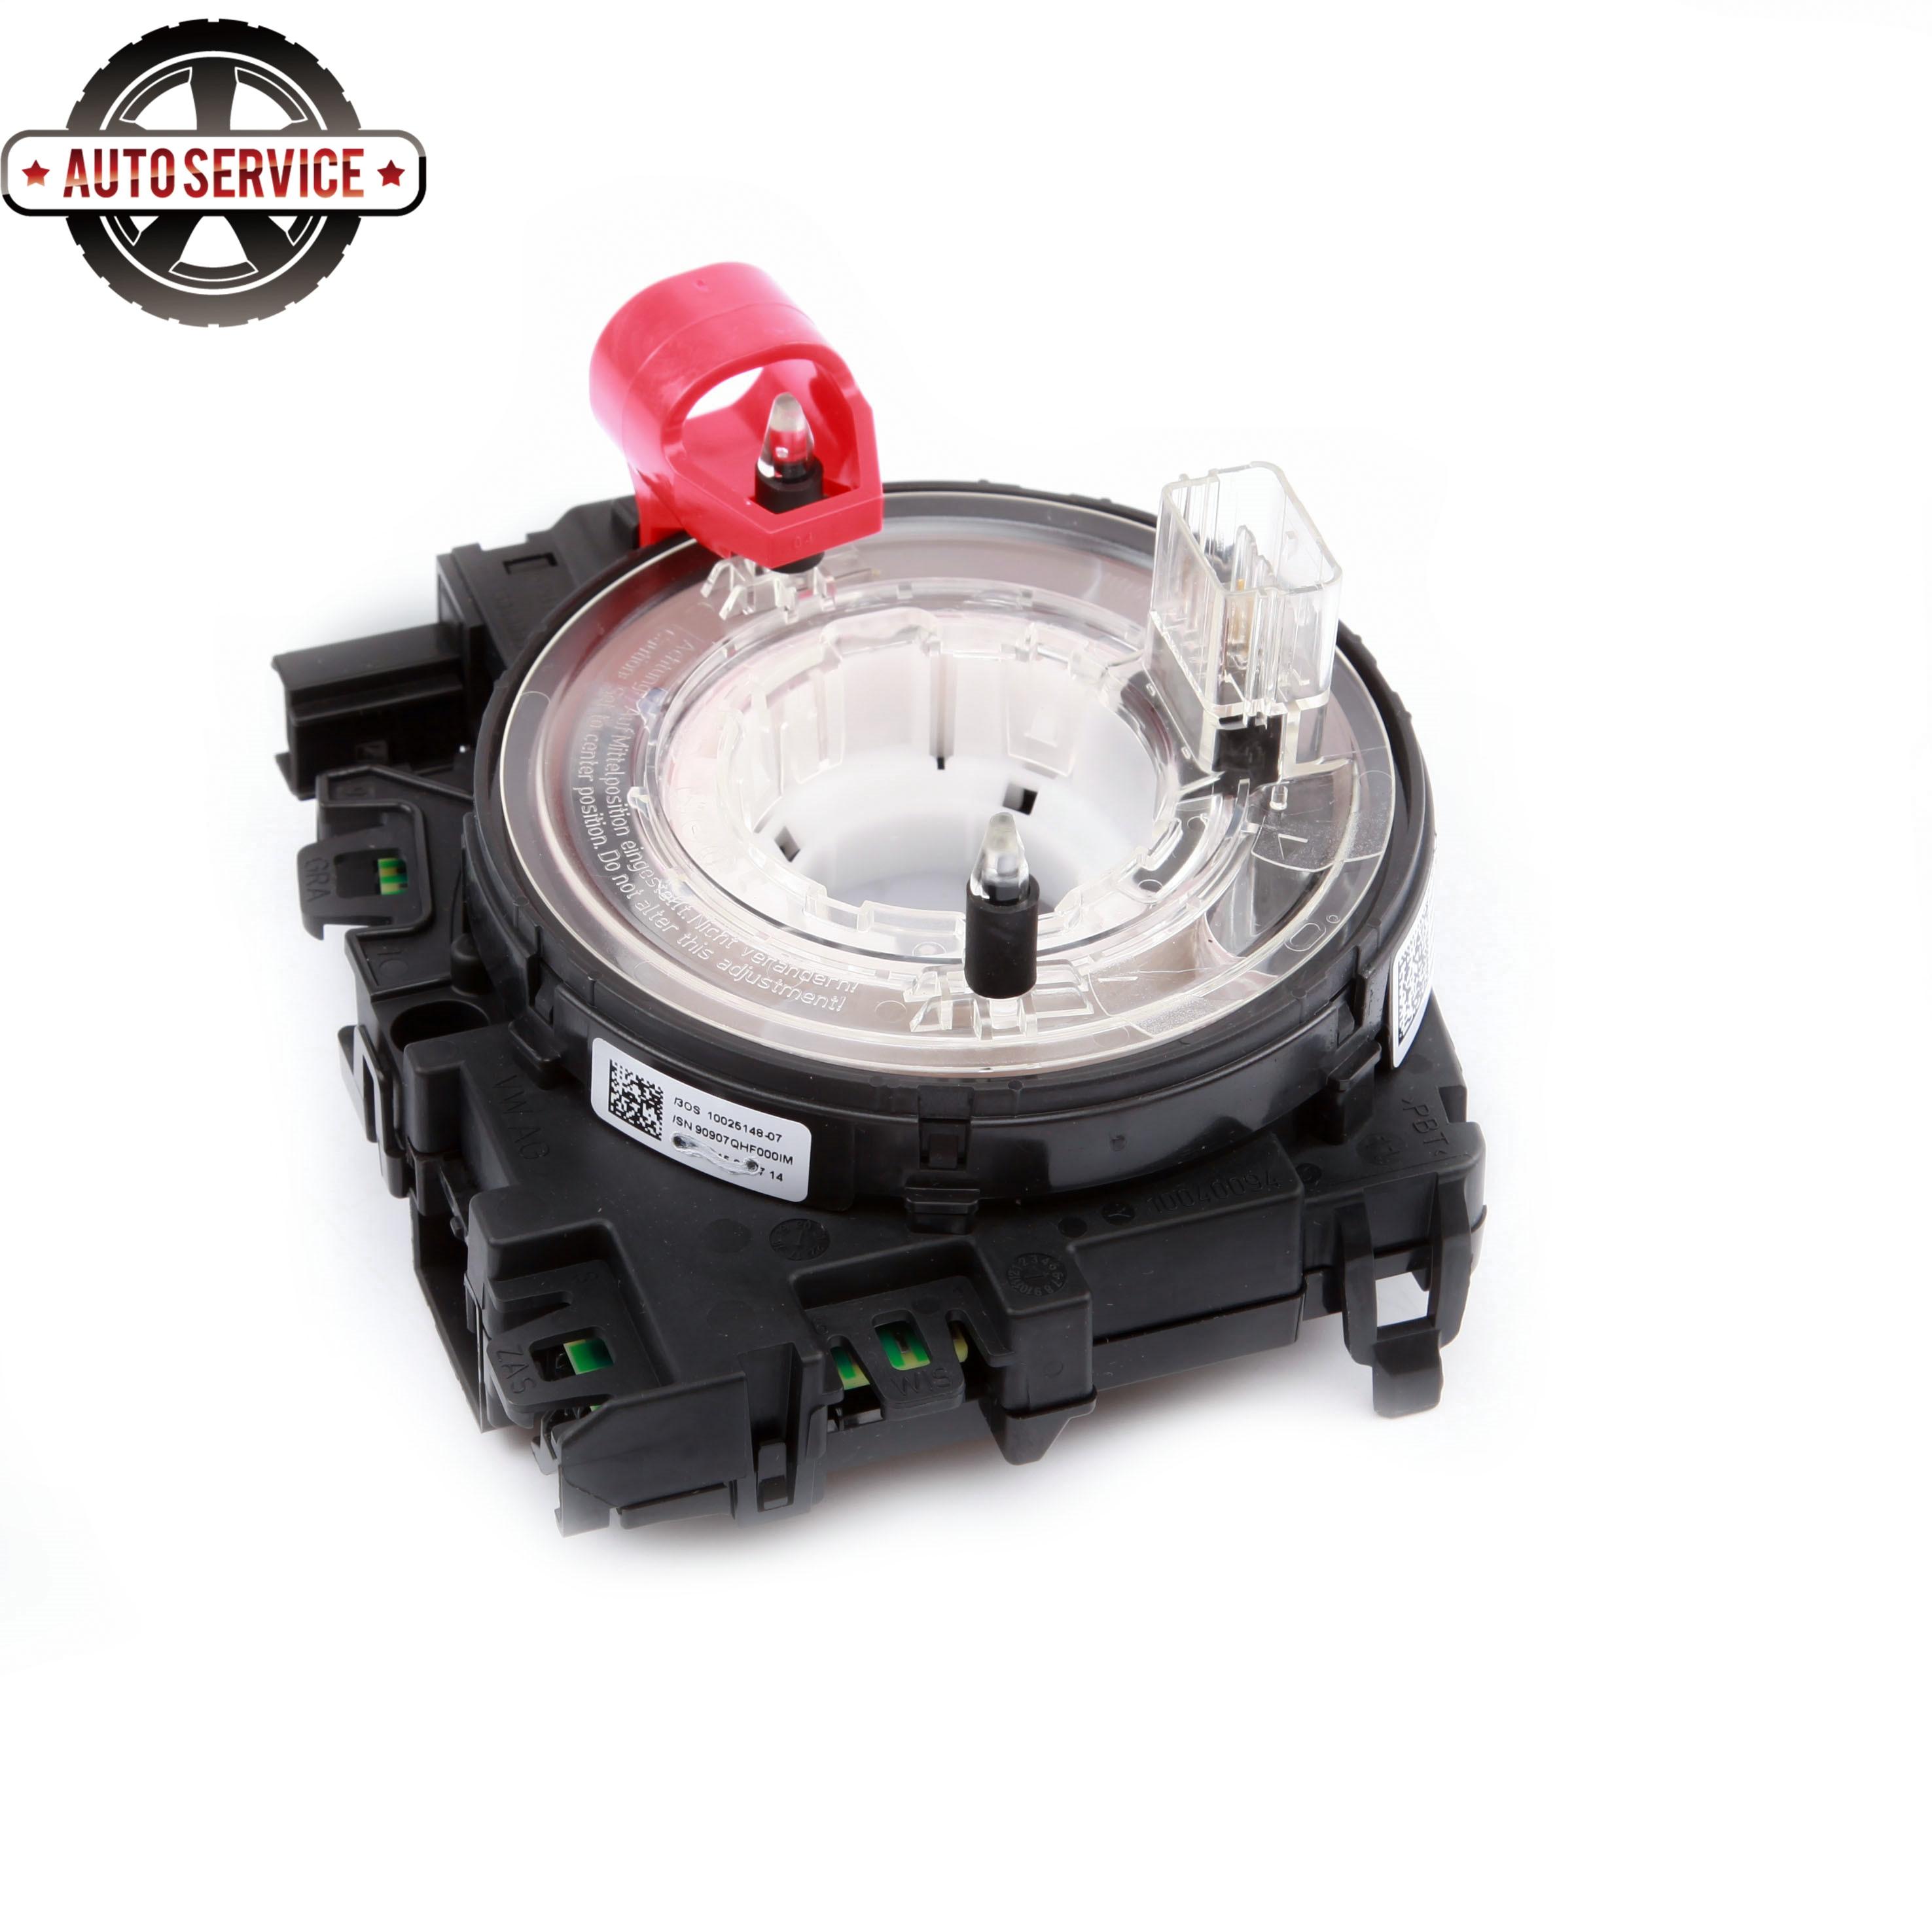 NEW 5K0 953 549 B 5K0953549 MF Multi-function Steering Wheel Module Control Unit For VW Volkswagen Golf MK6 Jetta MK6 Octavia